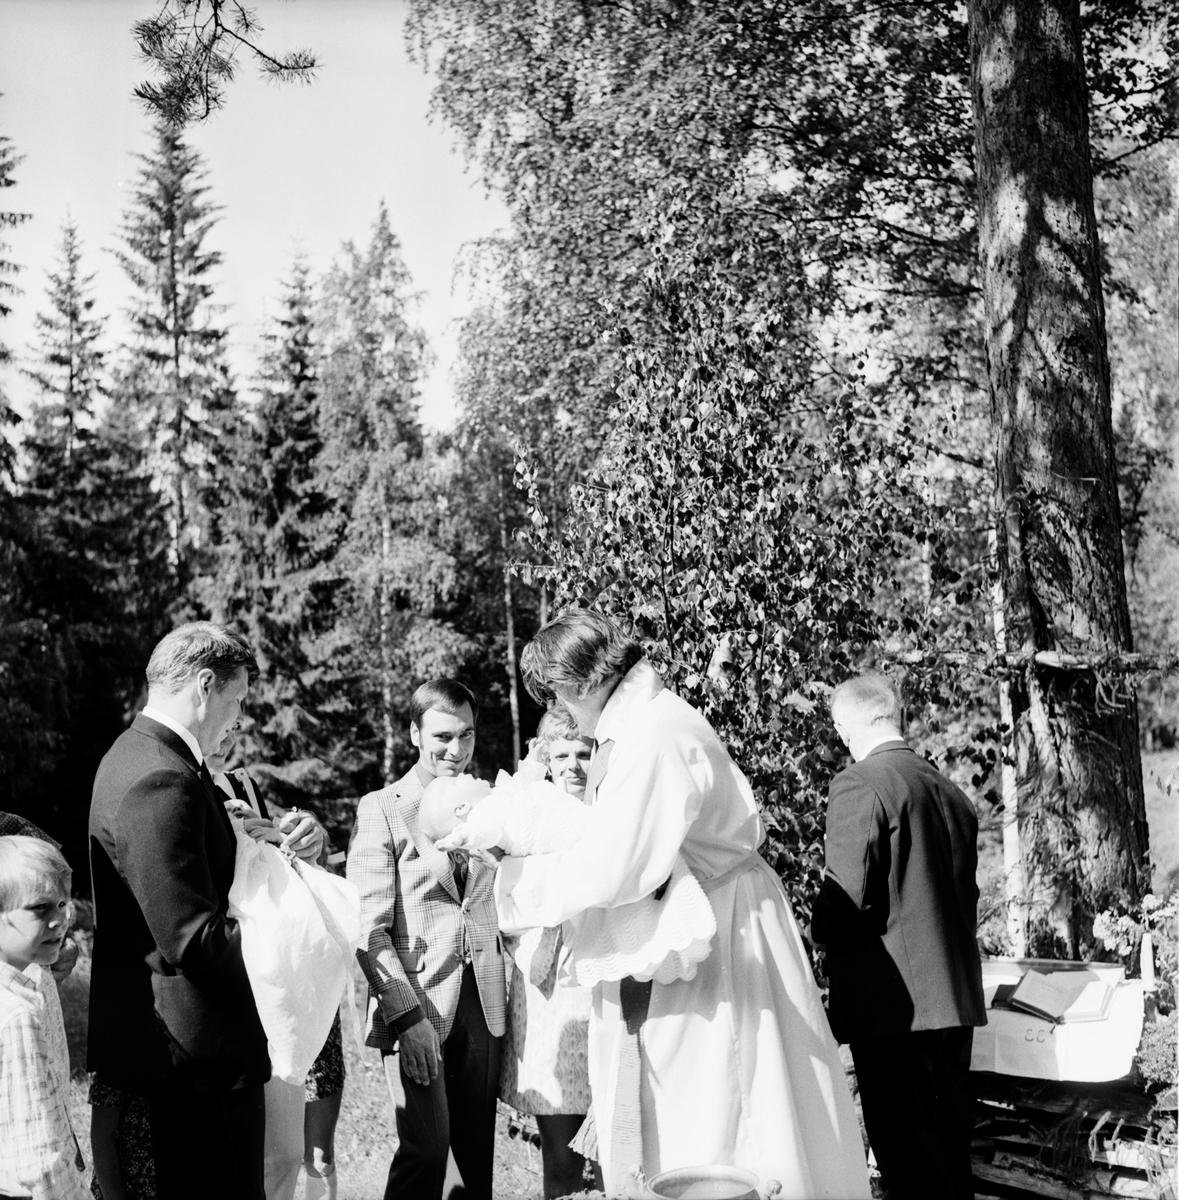 Änga-Nybo Dopdudstjänst. Juni 1972